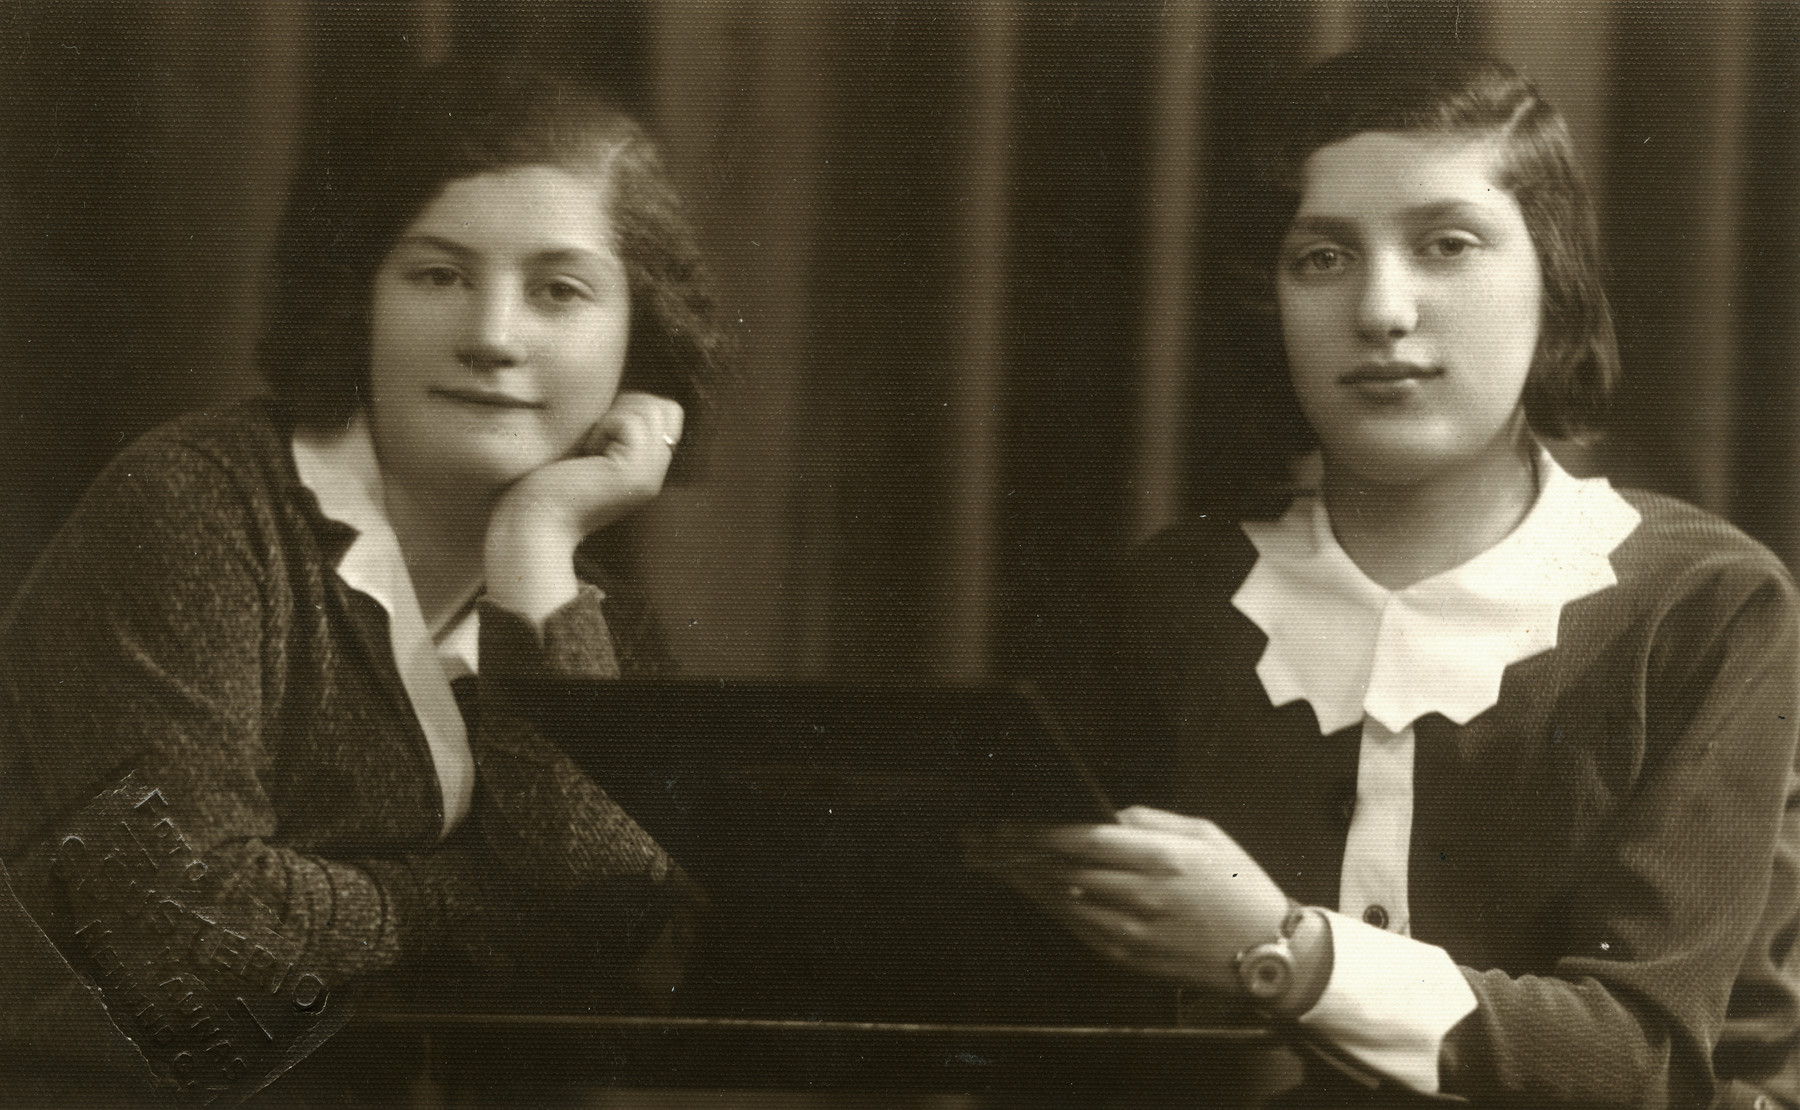 Studio portrait of Yiddish gymnasia students Rachel Godrov and her friend Lea.  Lea perished.